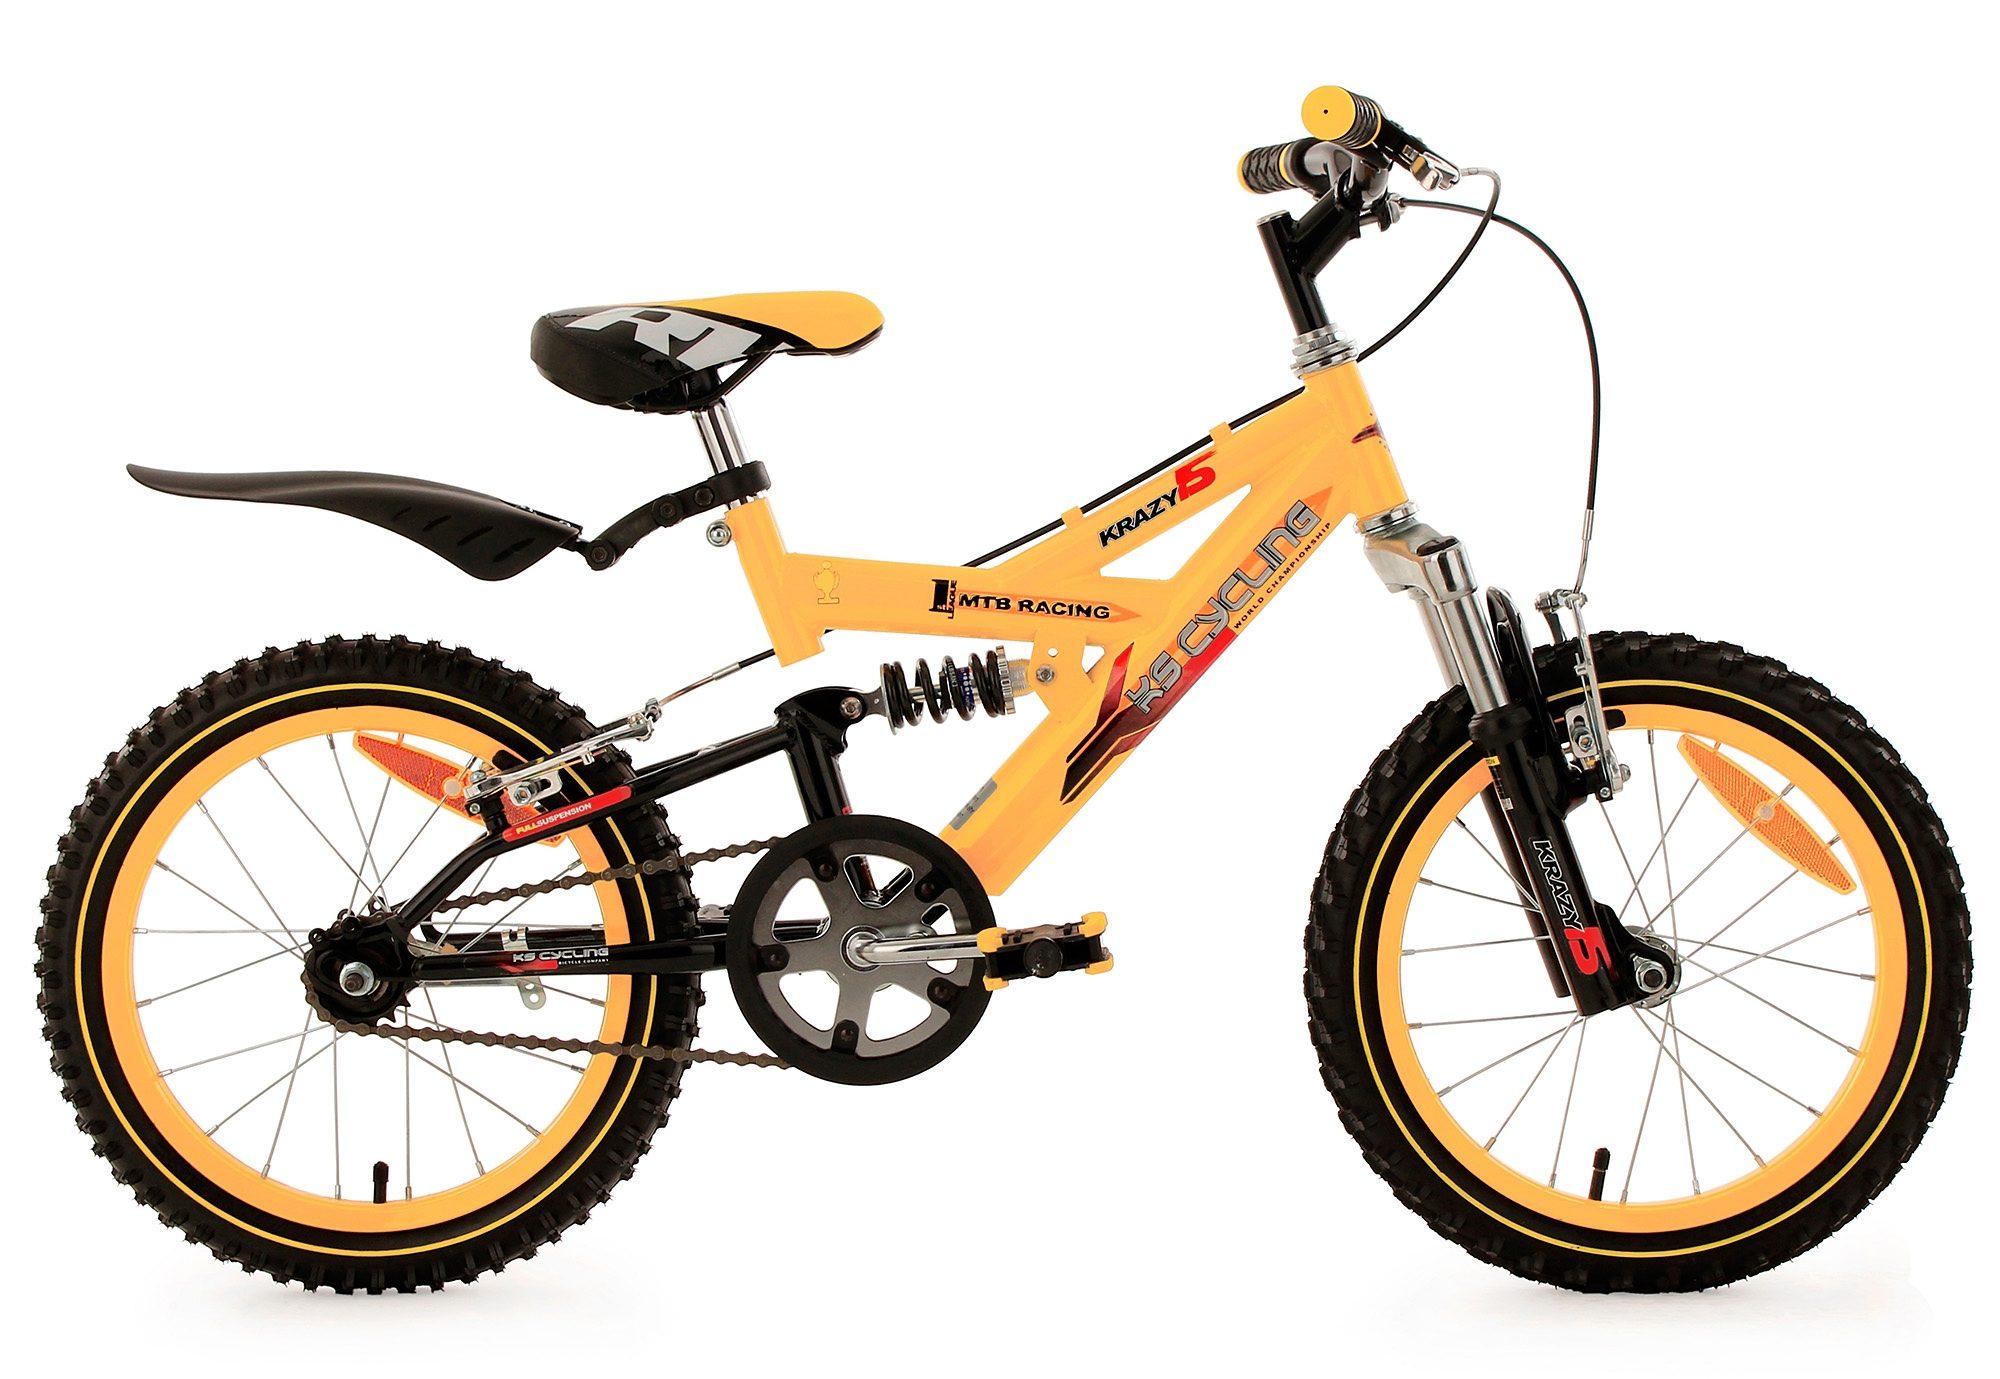 Kinderfahrrad, MTB, KS Cycling, »Krazy«, 16 Zoll, gelb, ohne Schaltung, Rücktritt